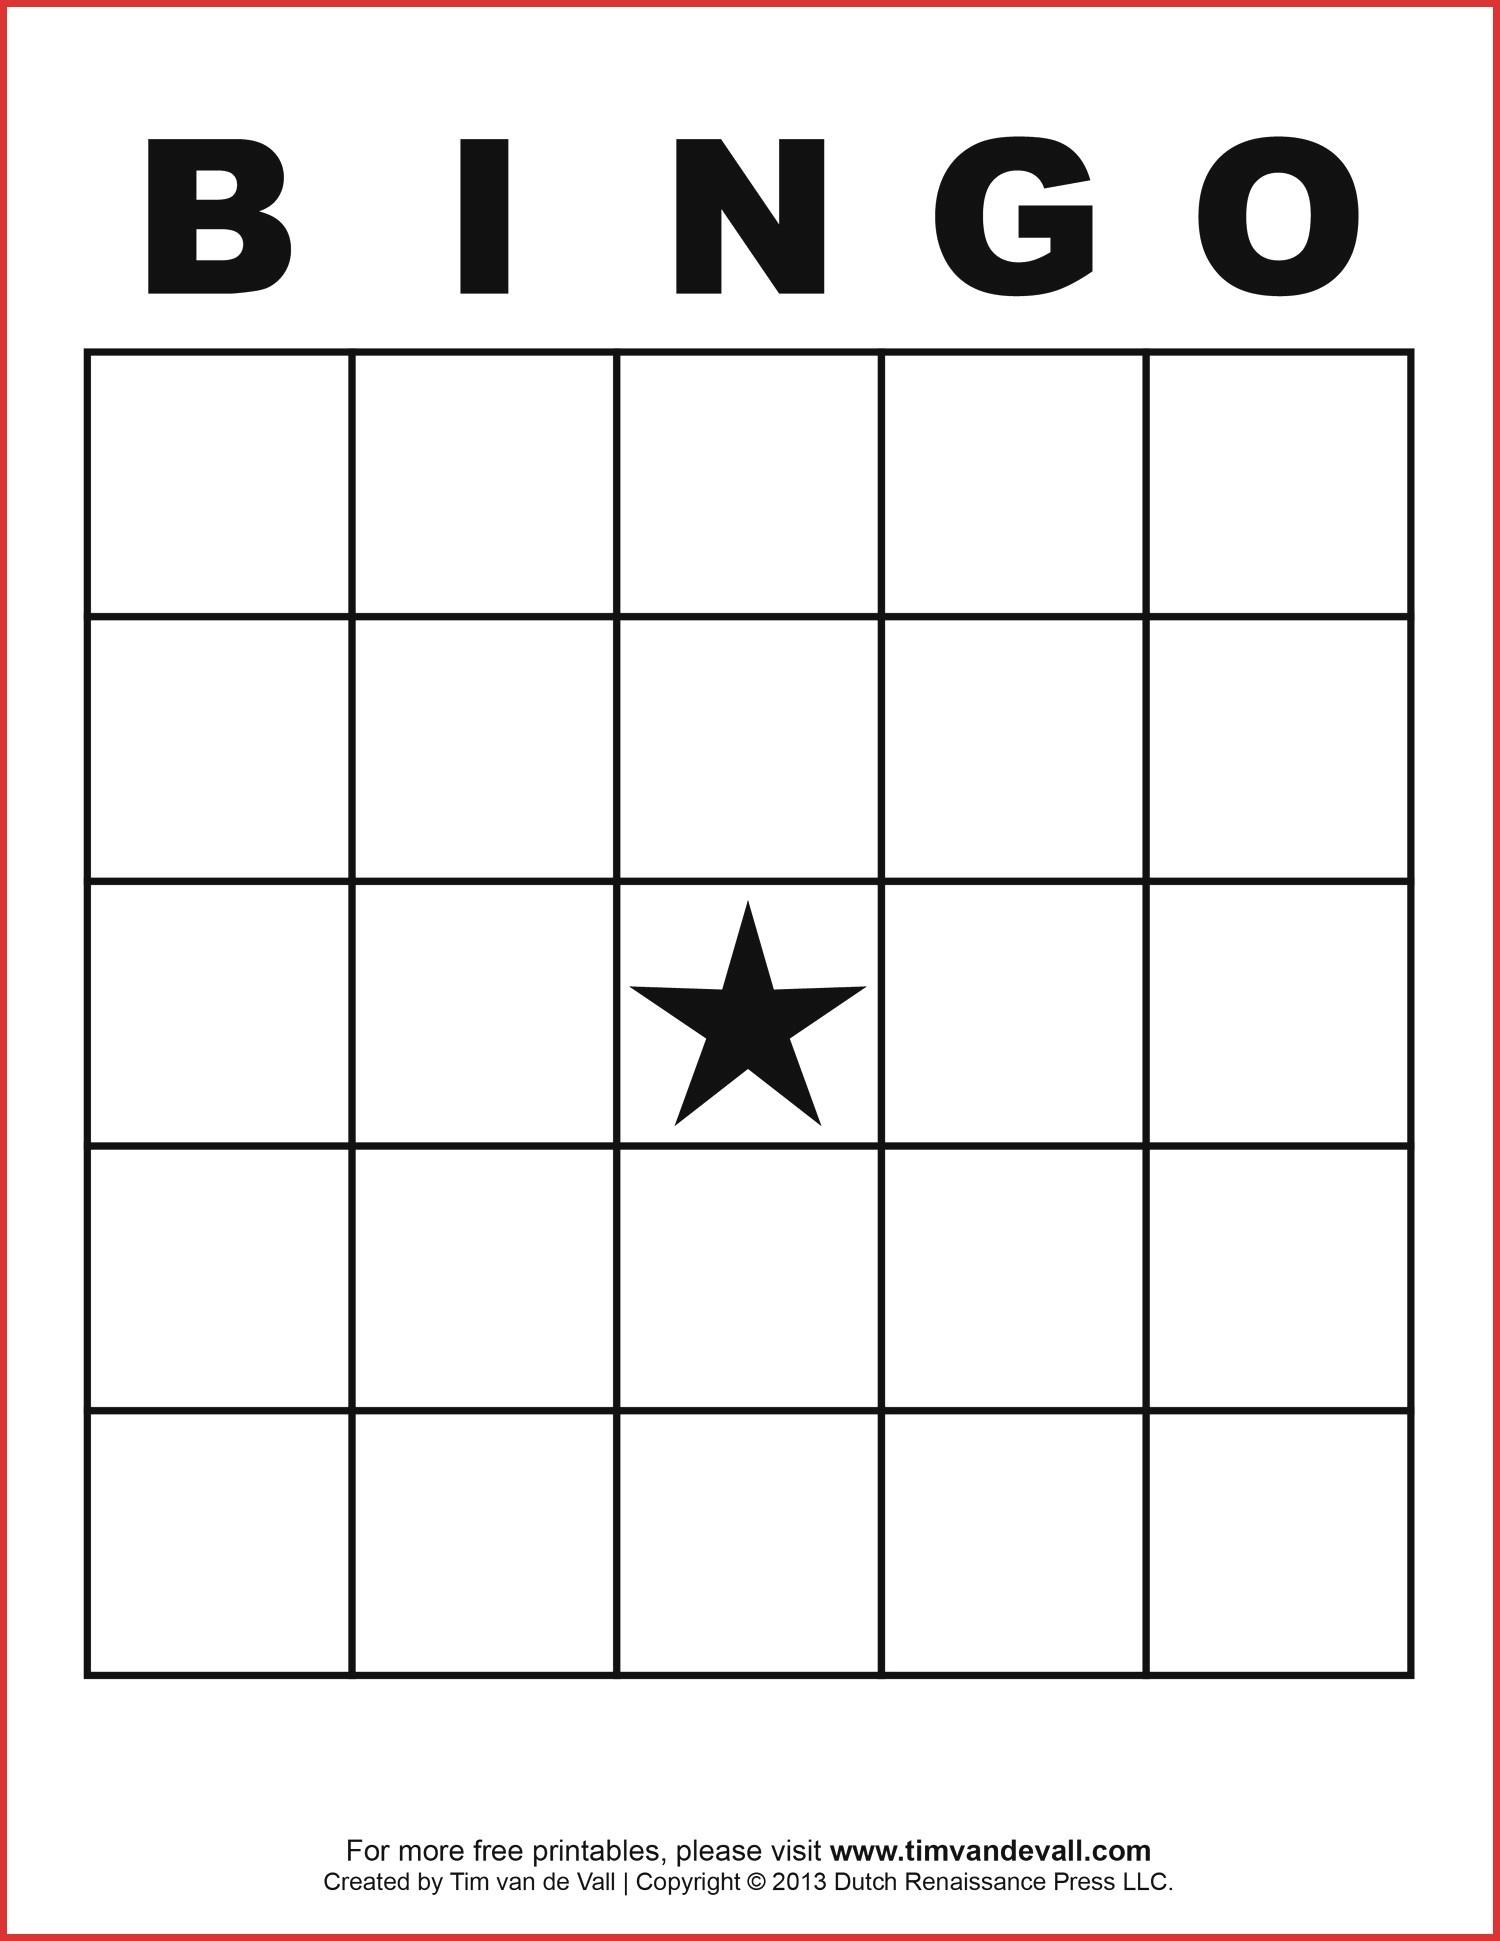 Awesome Bingo Board Template | Dos Joinery - Bingo Generator Free Printable